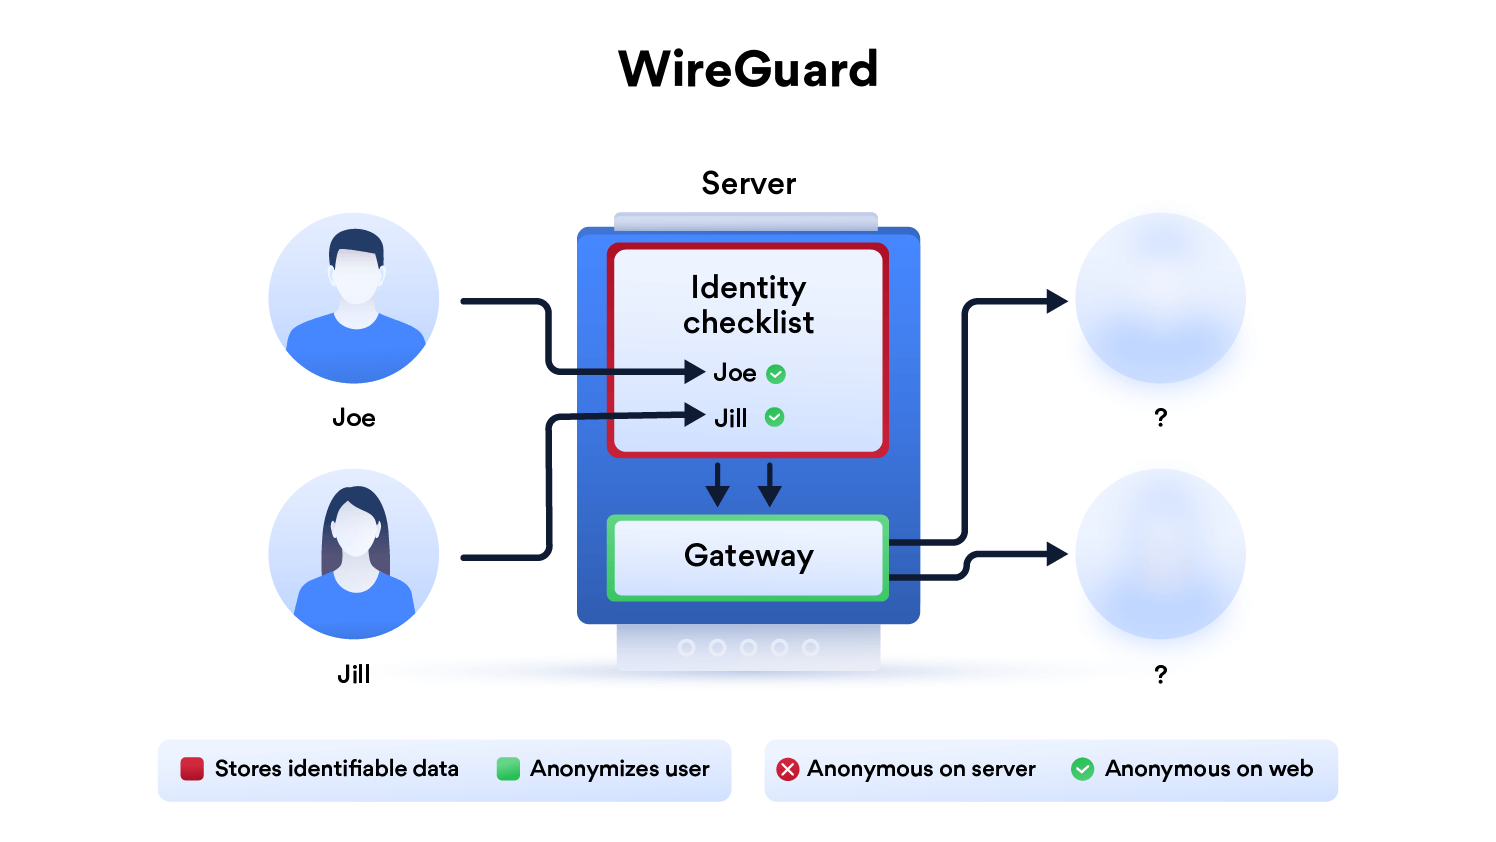 nordvpn-wireguard-infographic (1)